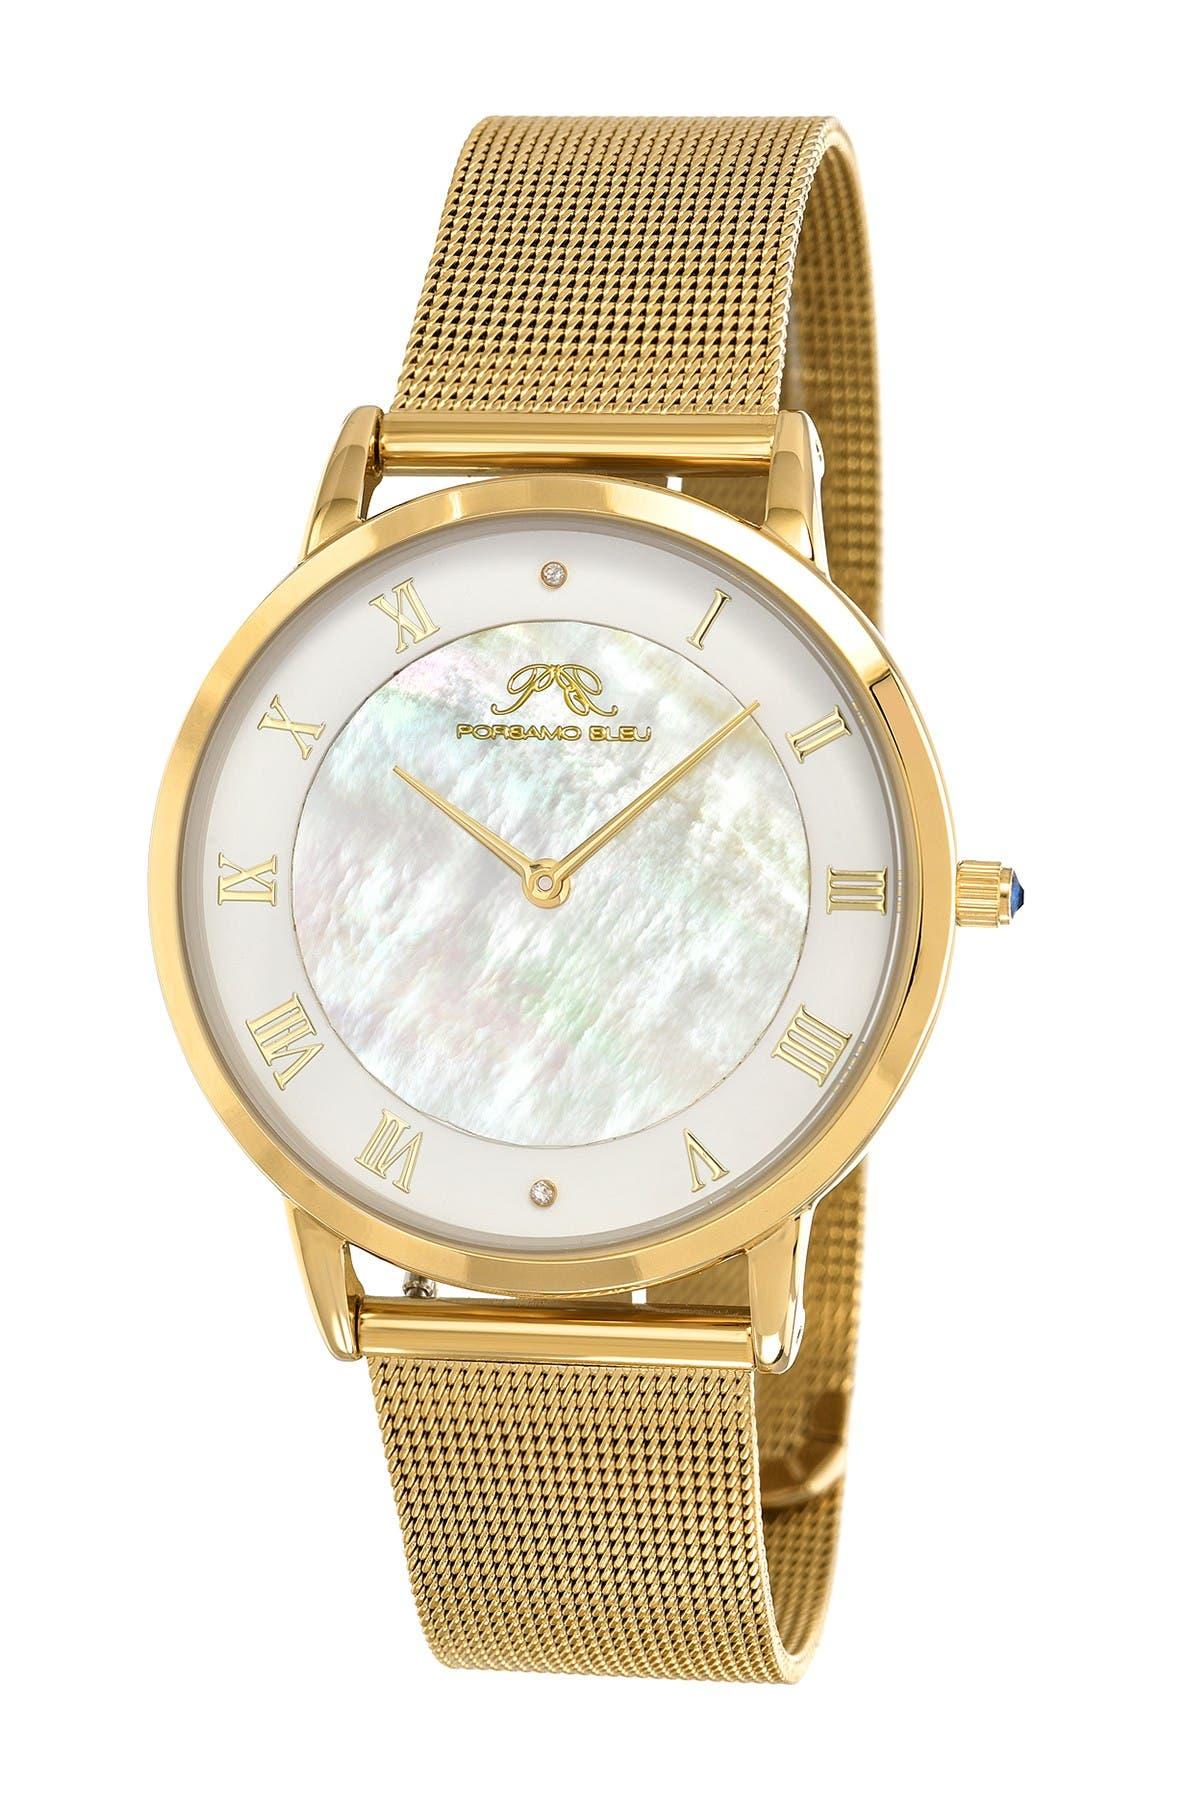 Image of Porsamo Bleu Women's Nina Interchangeable Bands Diamond Watch, 38mm - 0.01 ctw